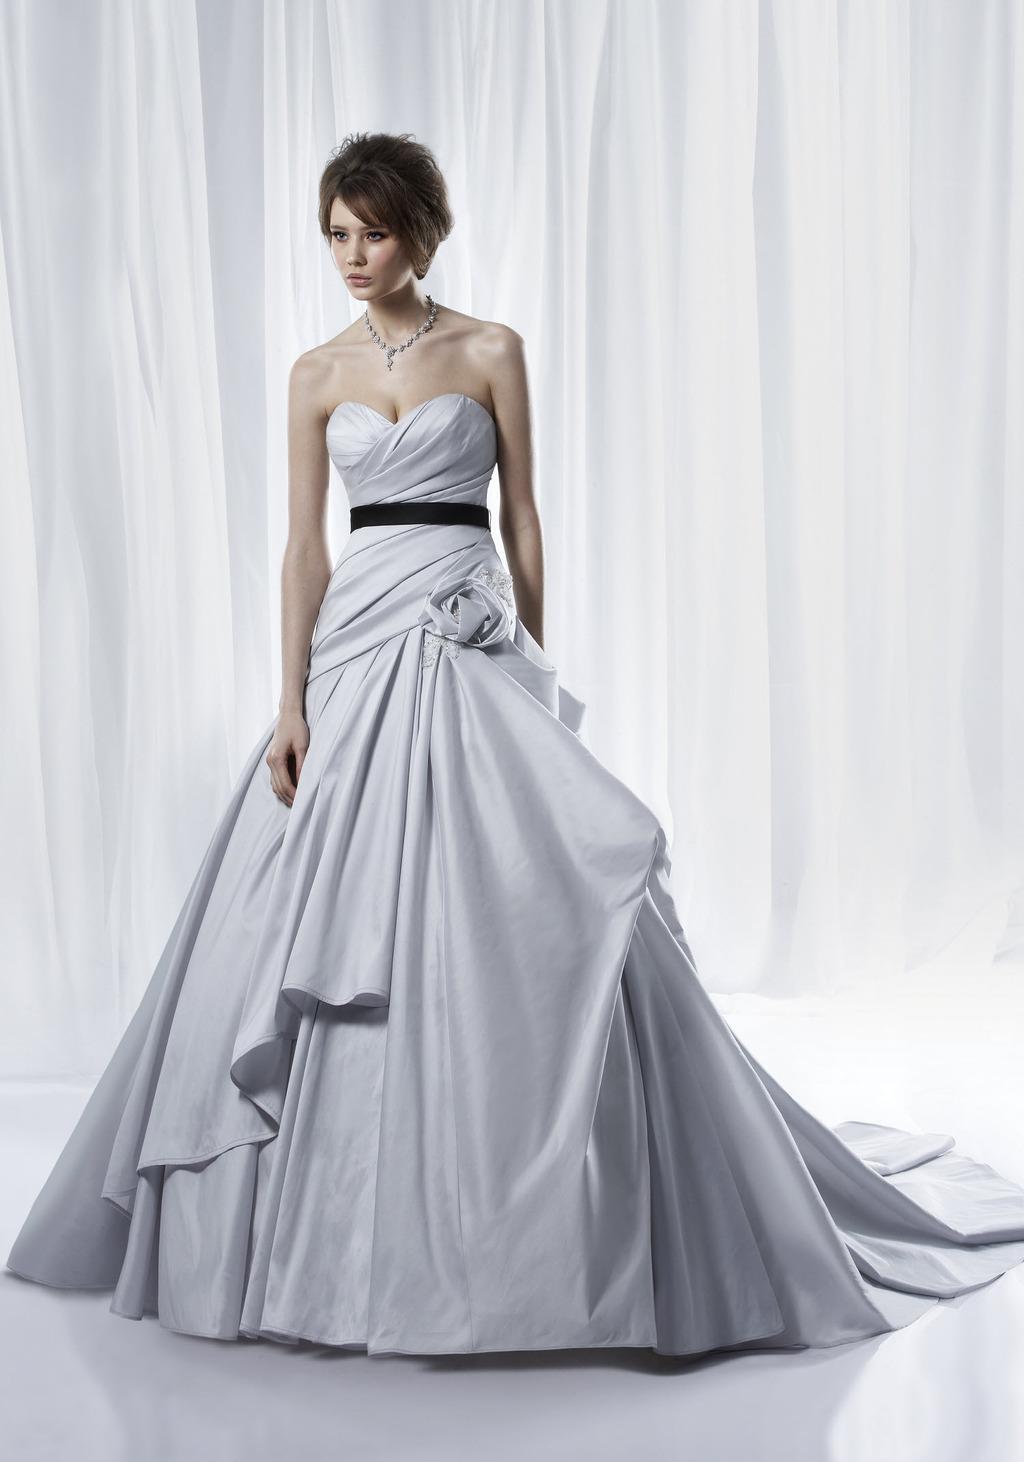 Non-white-wedding-dress-light-purple-silver-spring-2012-ballgown-wedding-dresses-black-bridal-sash-c102a.full